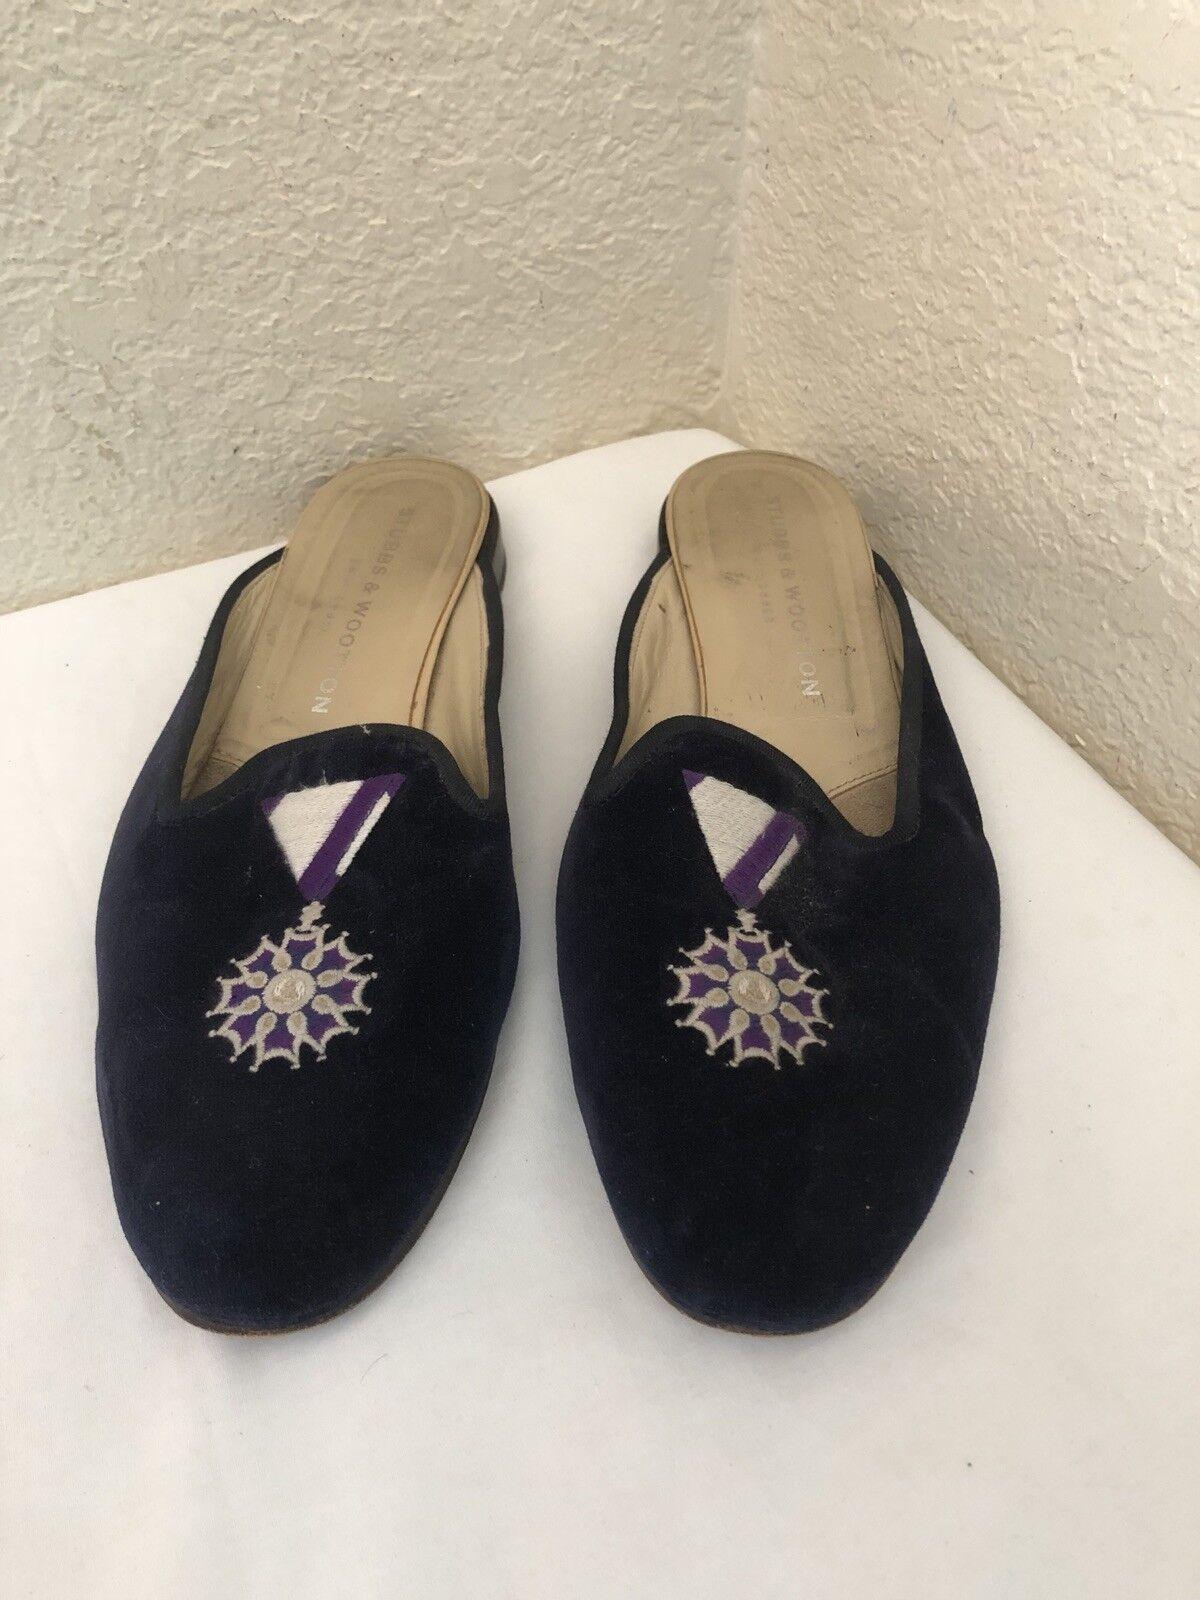 Stubbs & Wootton Indigo Velvet violet Medal Mule Slippers chaussures femmes SZ 9